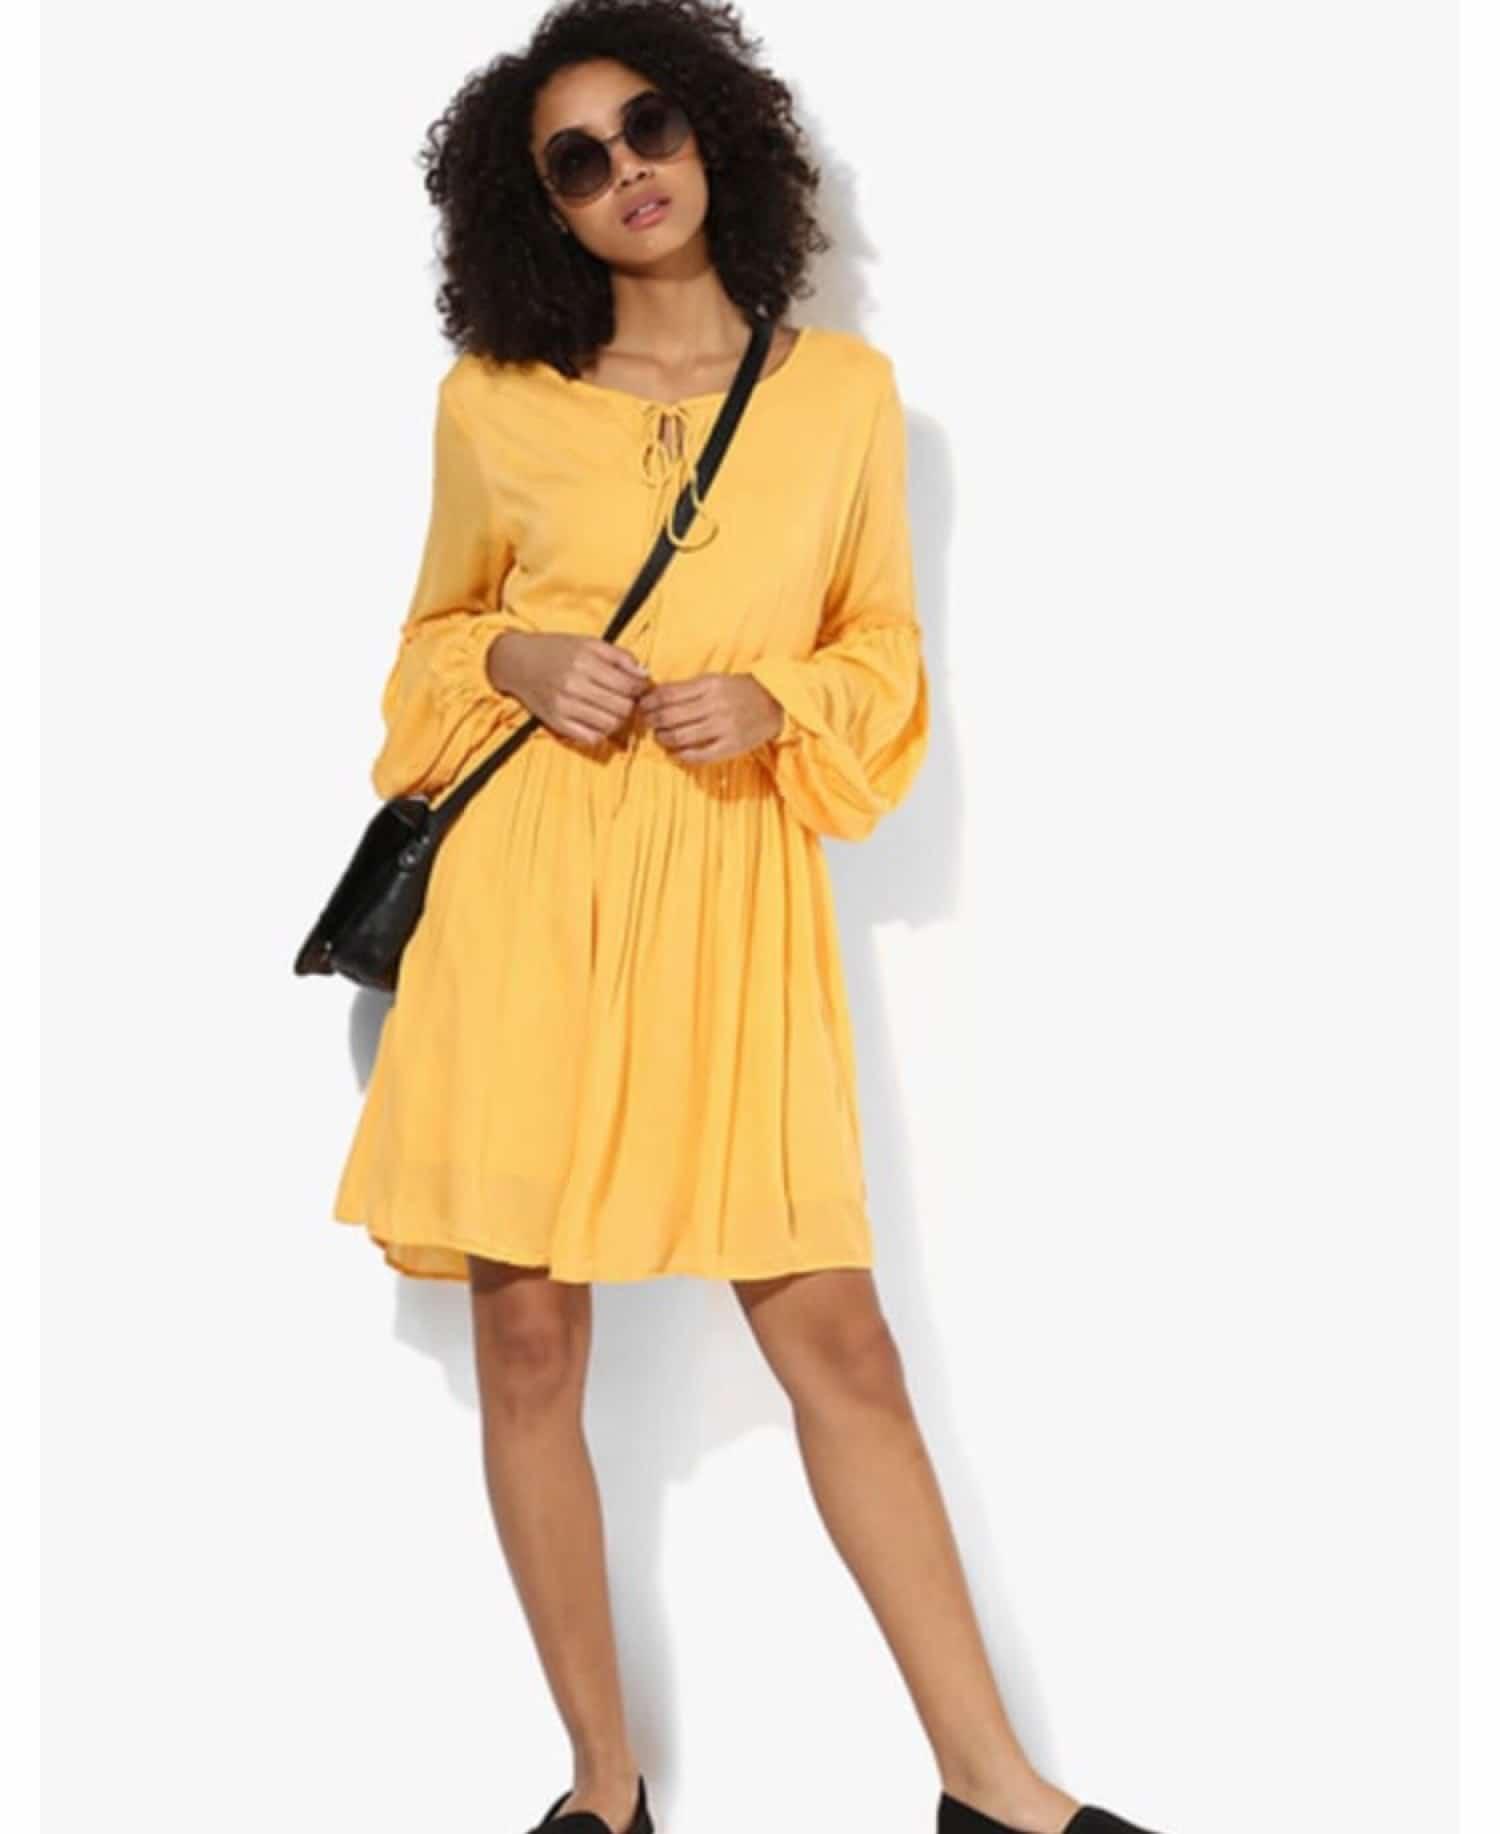 Flat 50% off ₹799 only          #summerdress #bohodress #western-dress #dressonline #summerfashion #ootdshare  #summerdresses